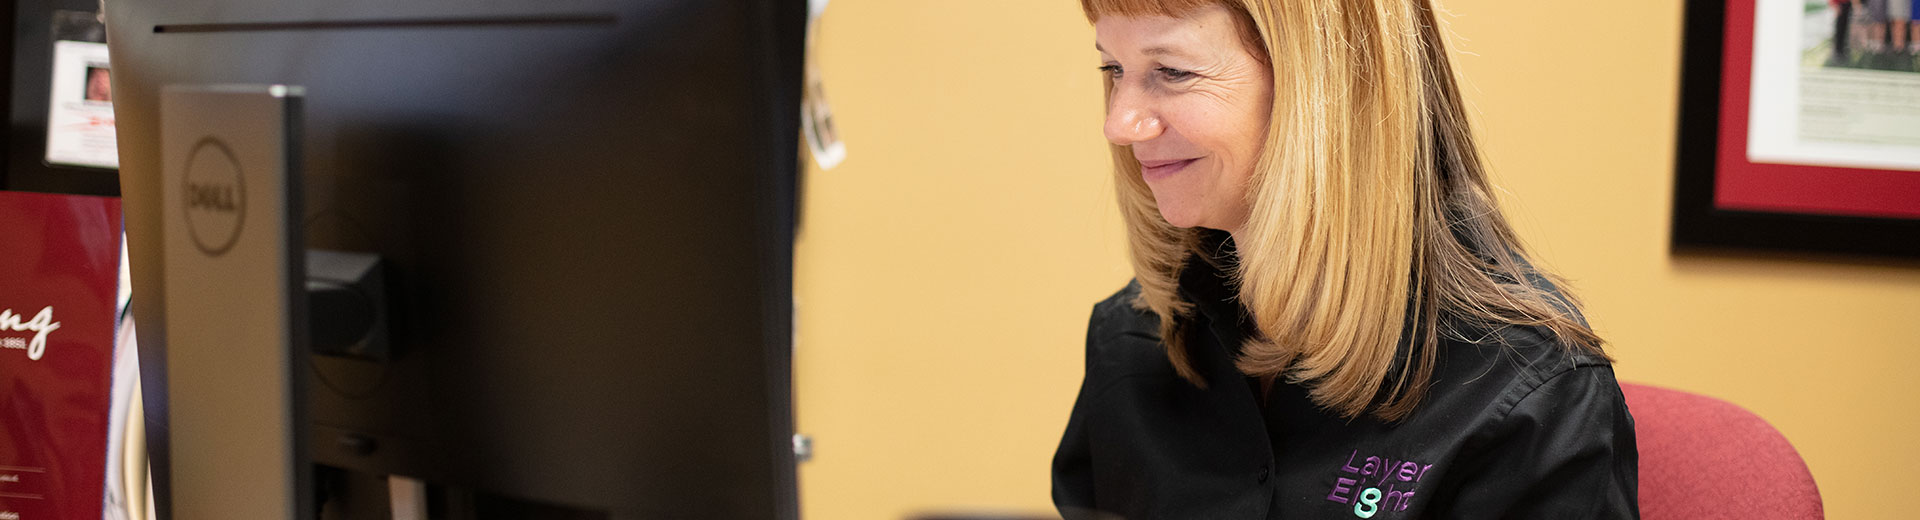 Woman working at LayerEight